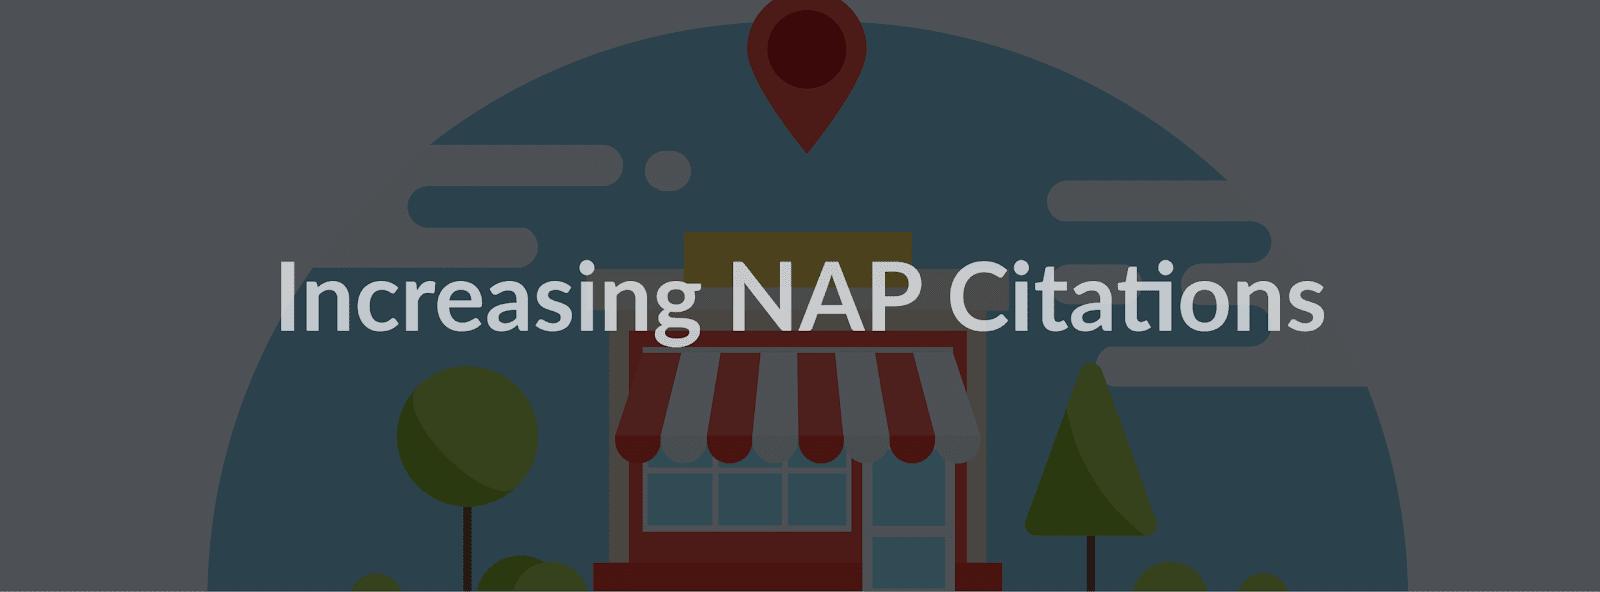 Increasing NAP Citations